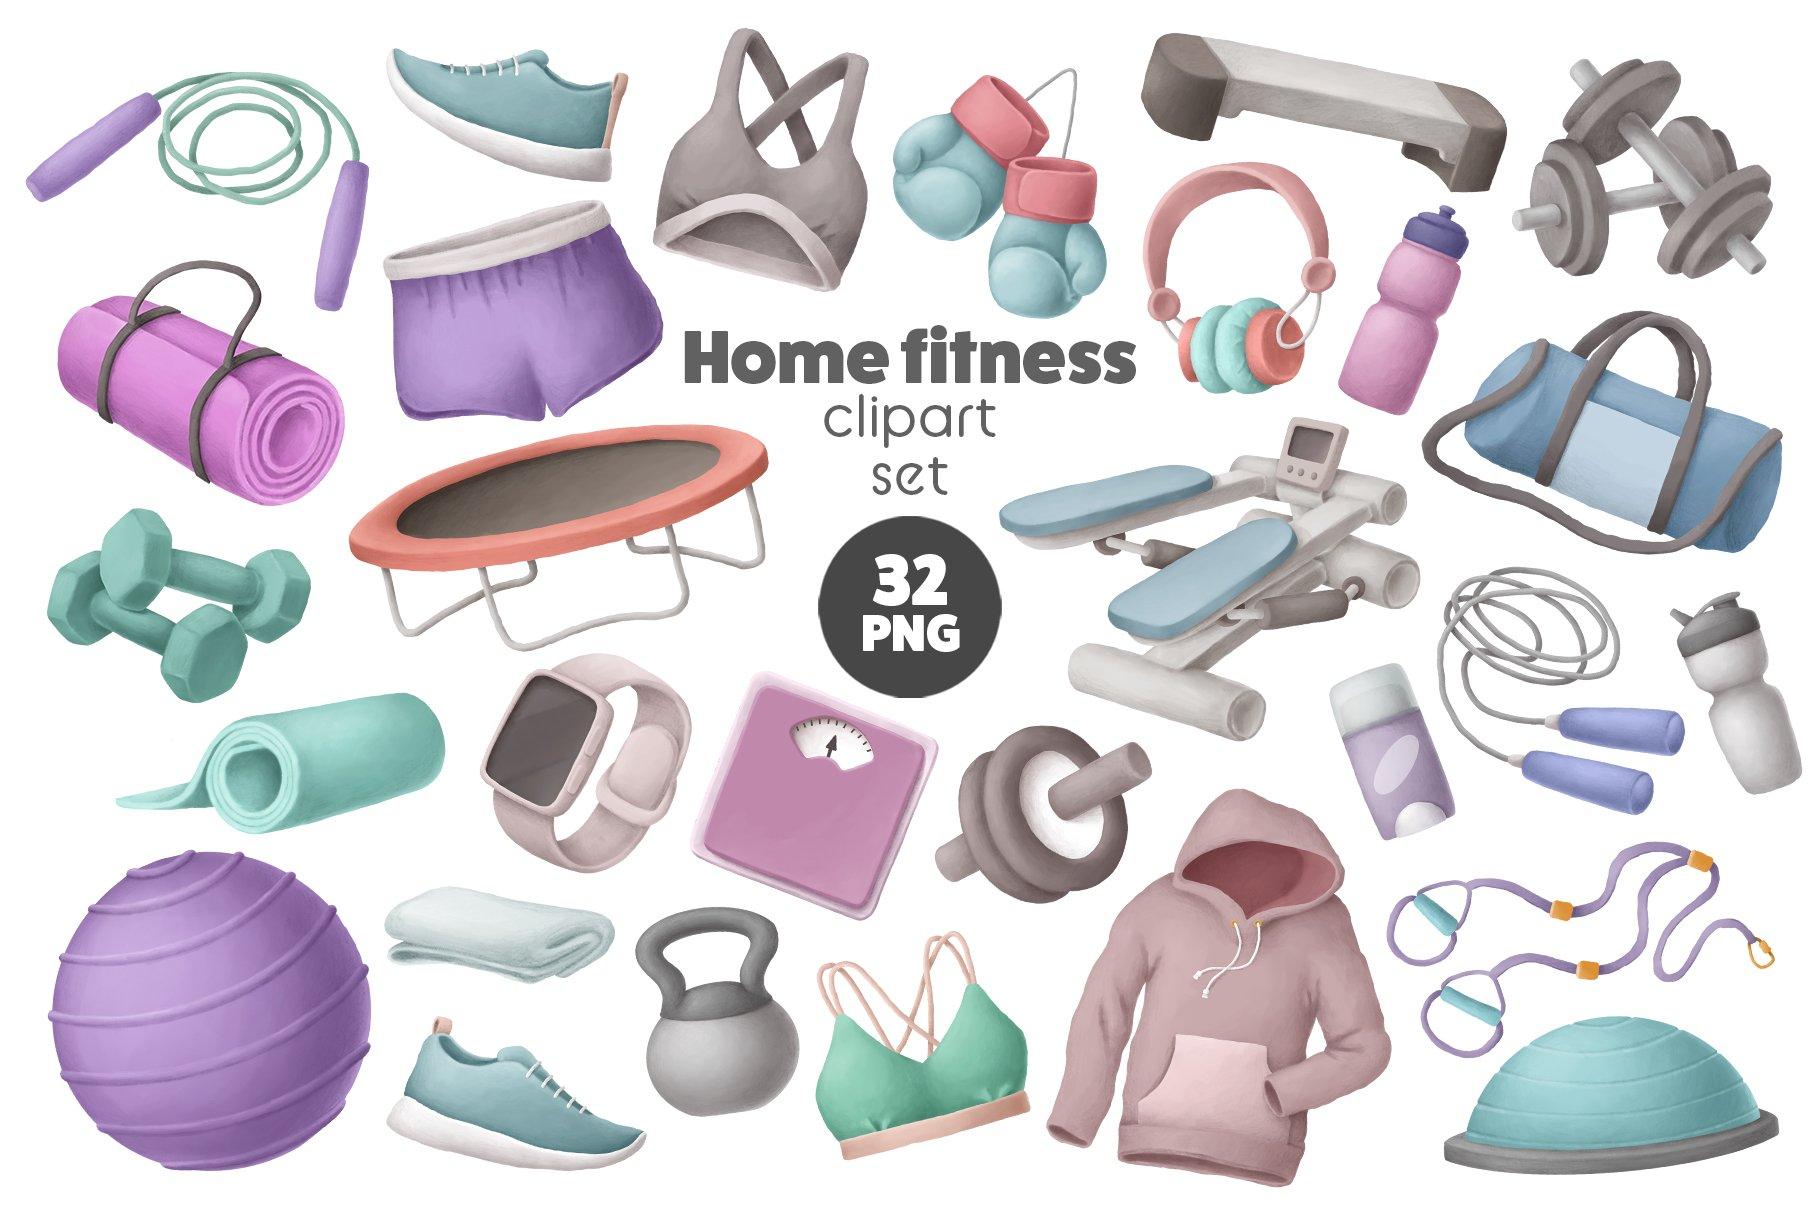 Sport Girls Clip art and Digital Paper Set Sports clipart | Etsy | Clip art,  Digital paper, Girls clips